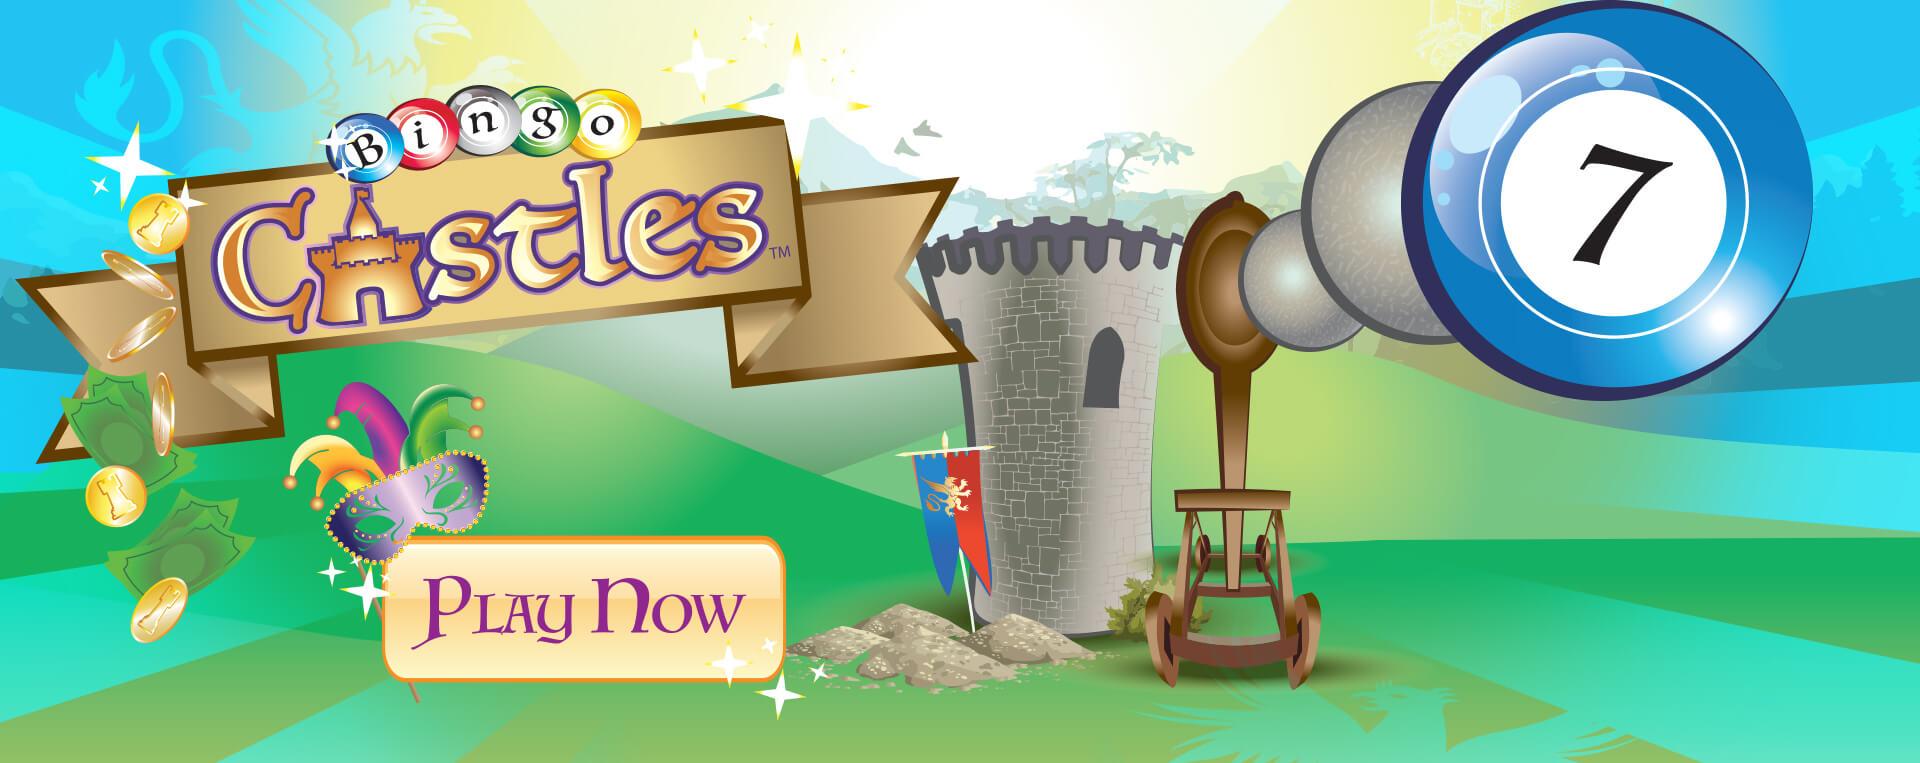 Bingo-Castles